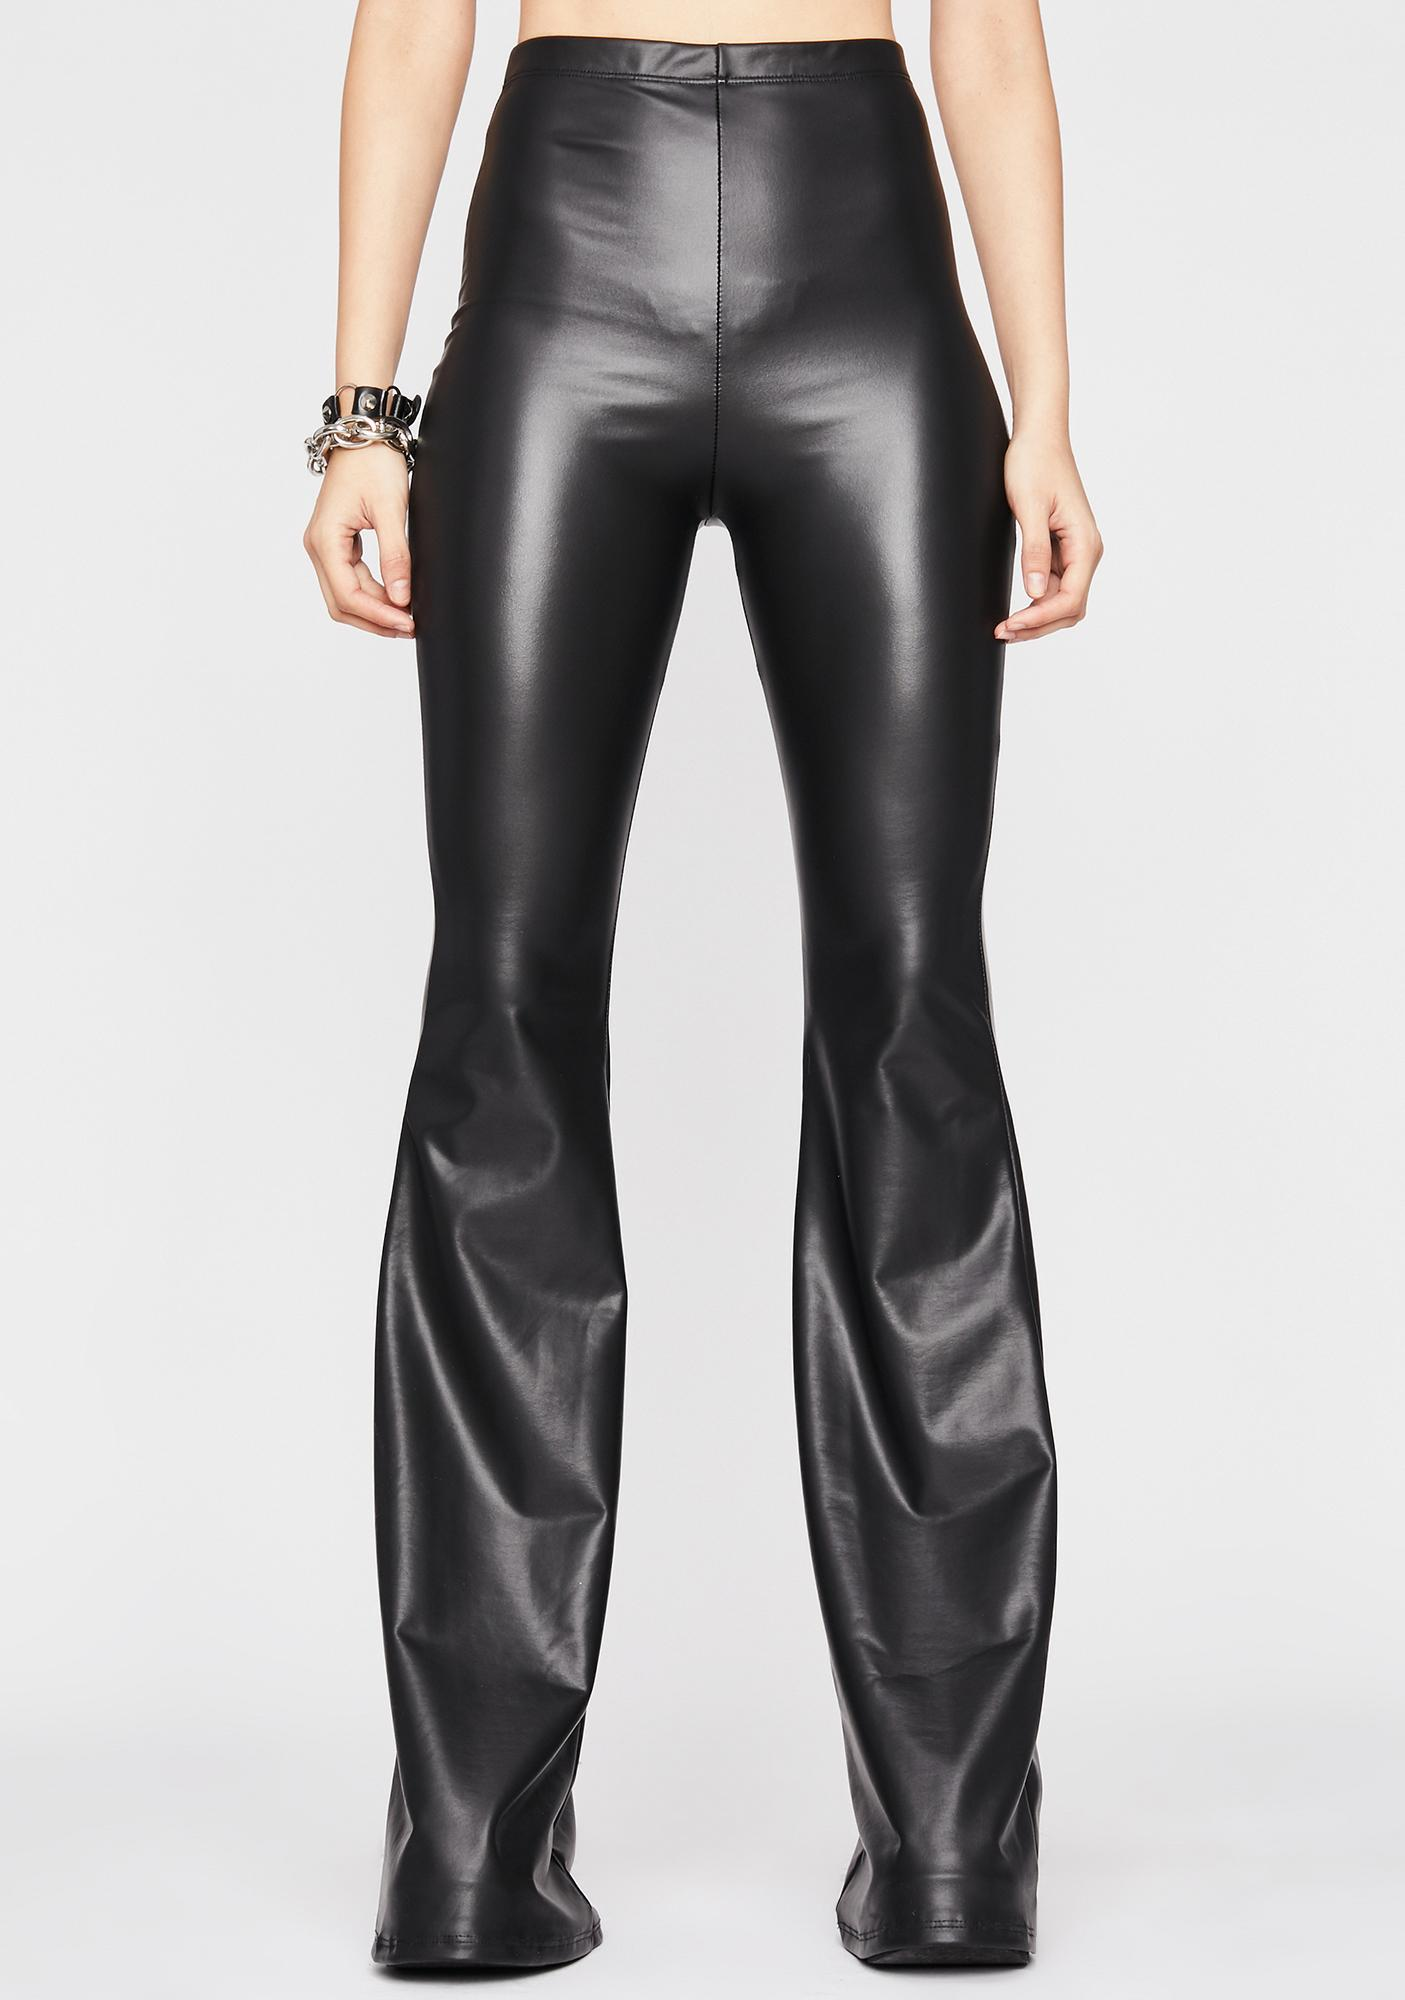 Pain Playa Leather Pants